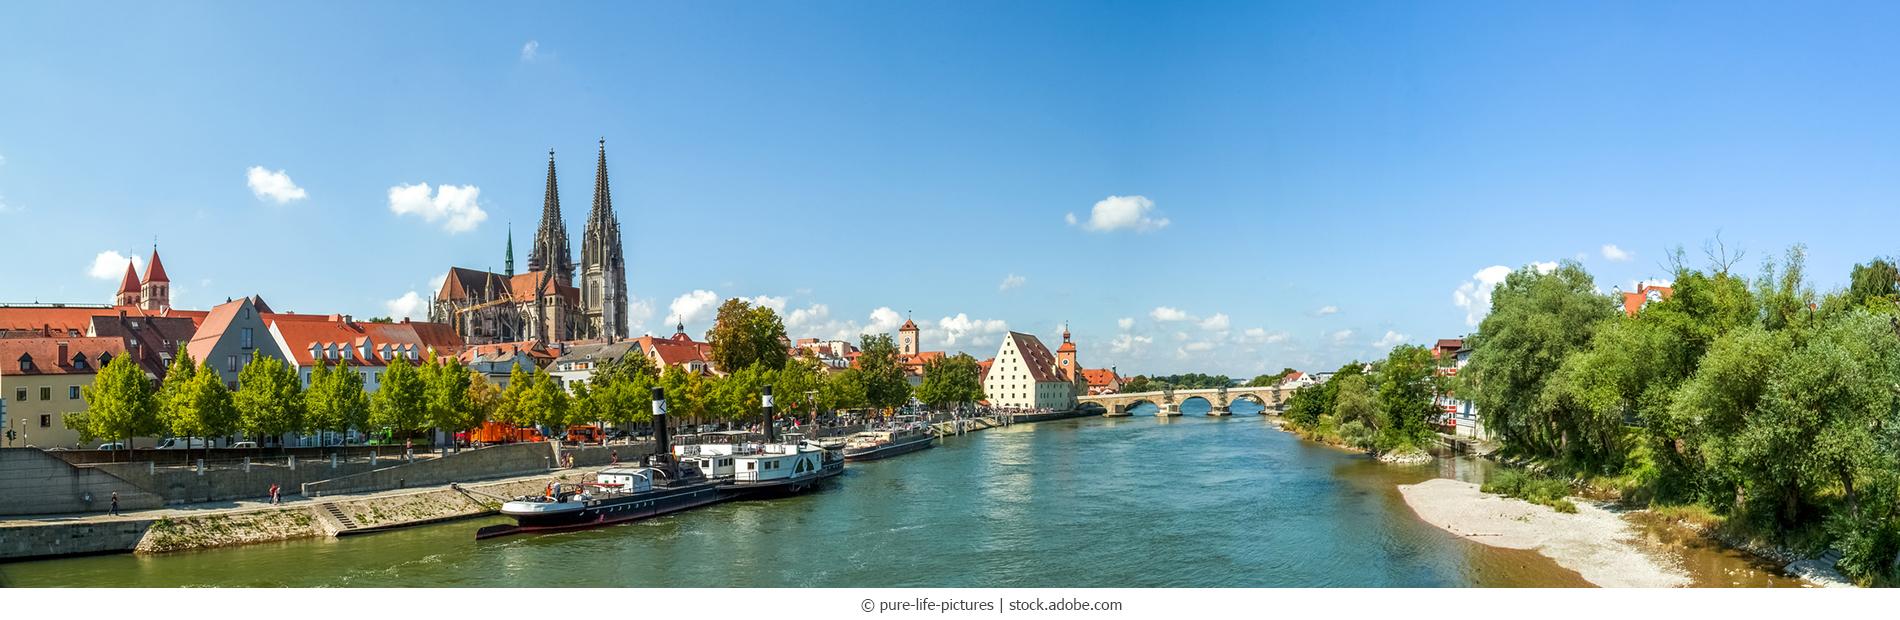 Regensburg_171302548_M_webC